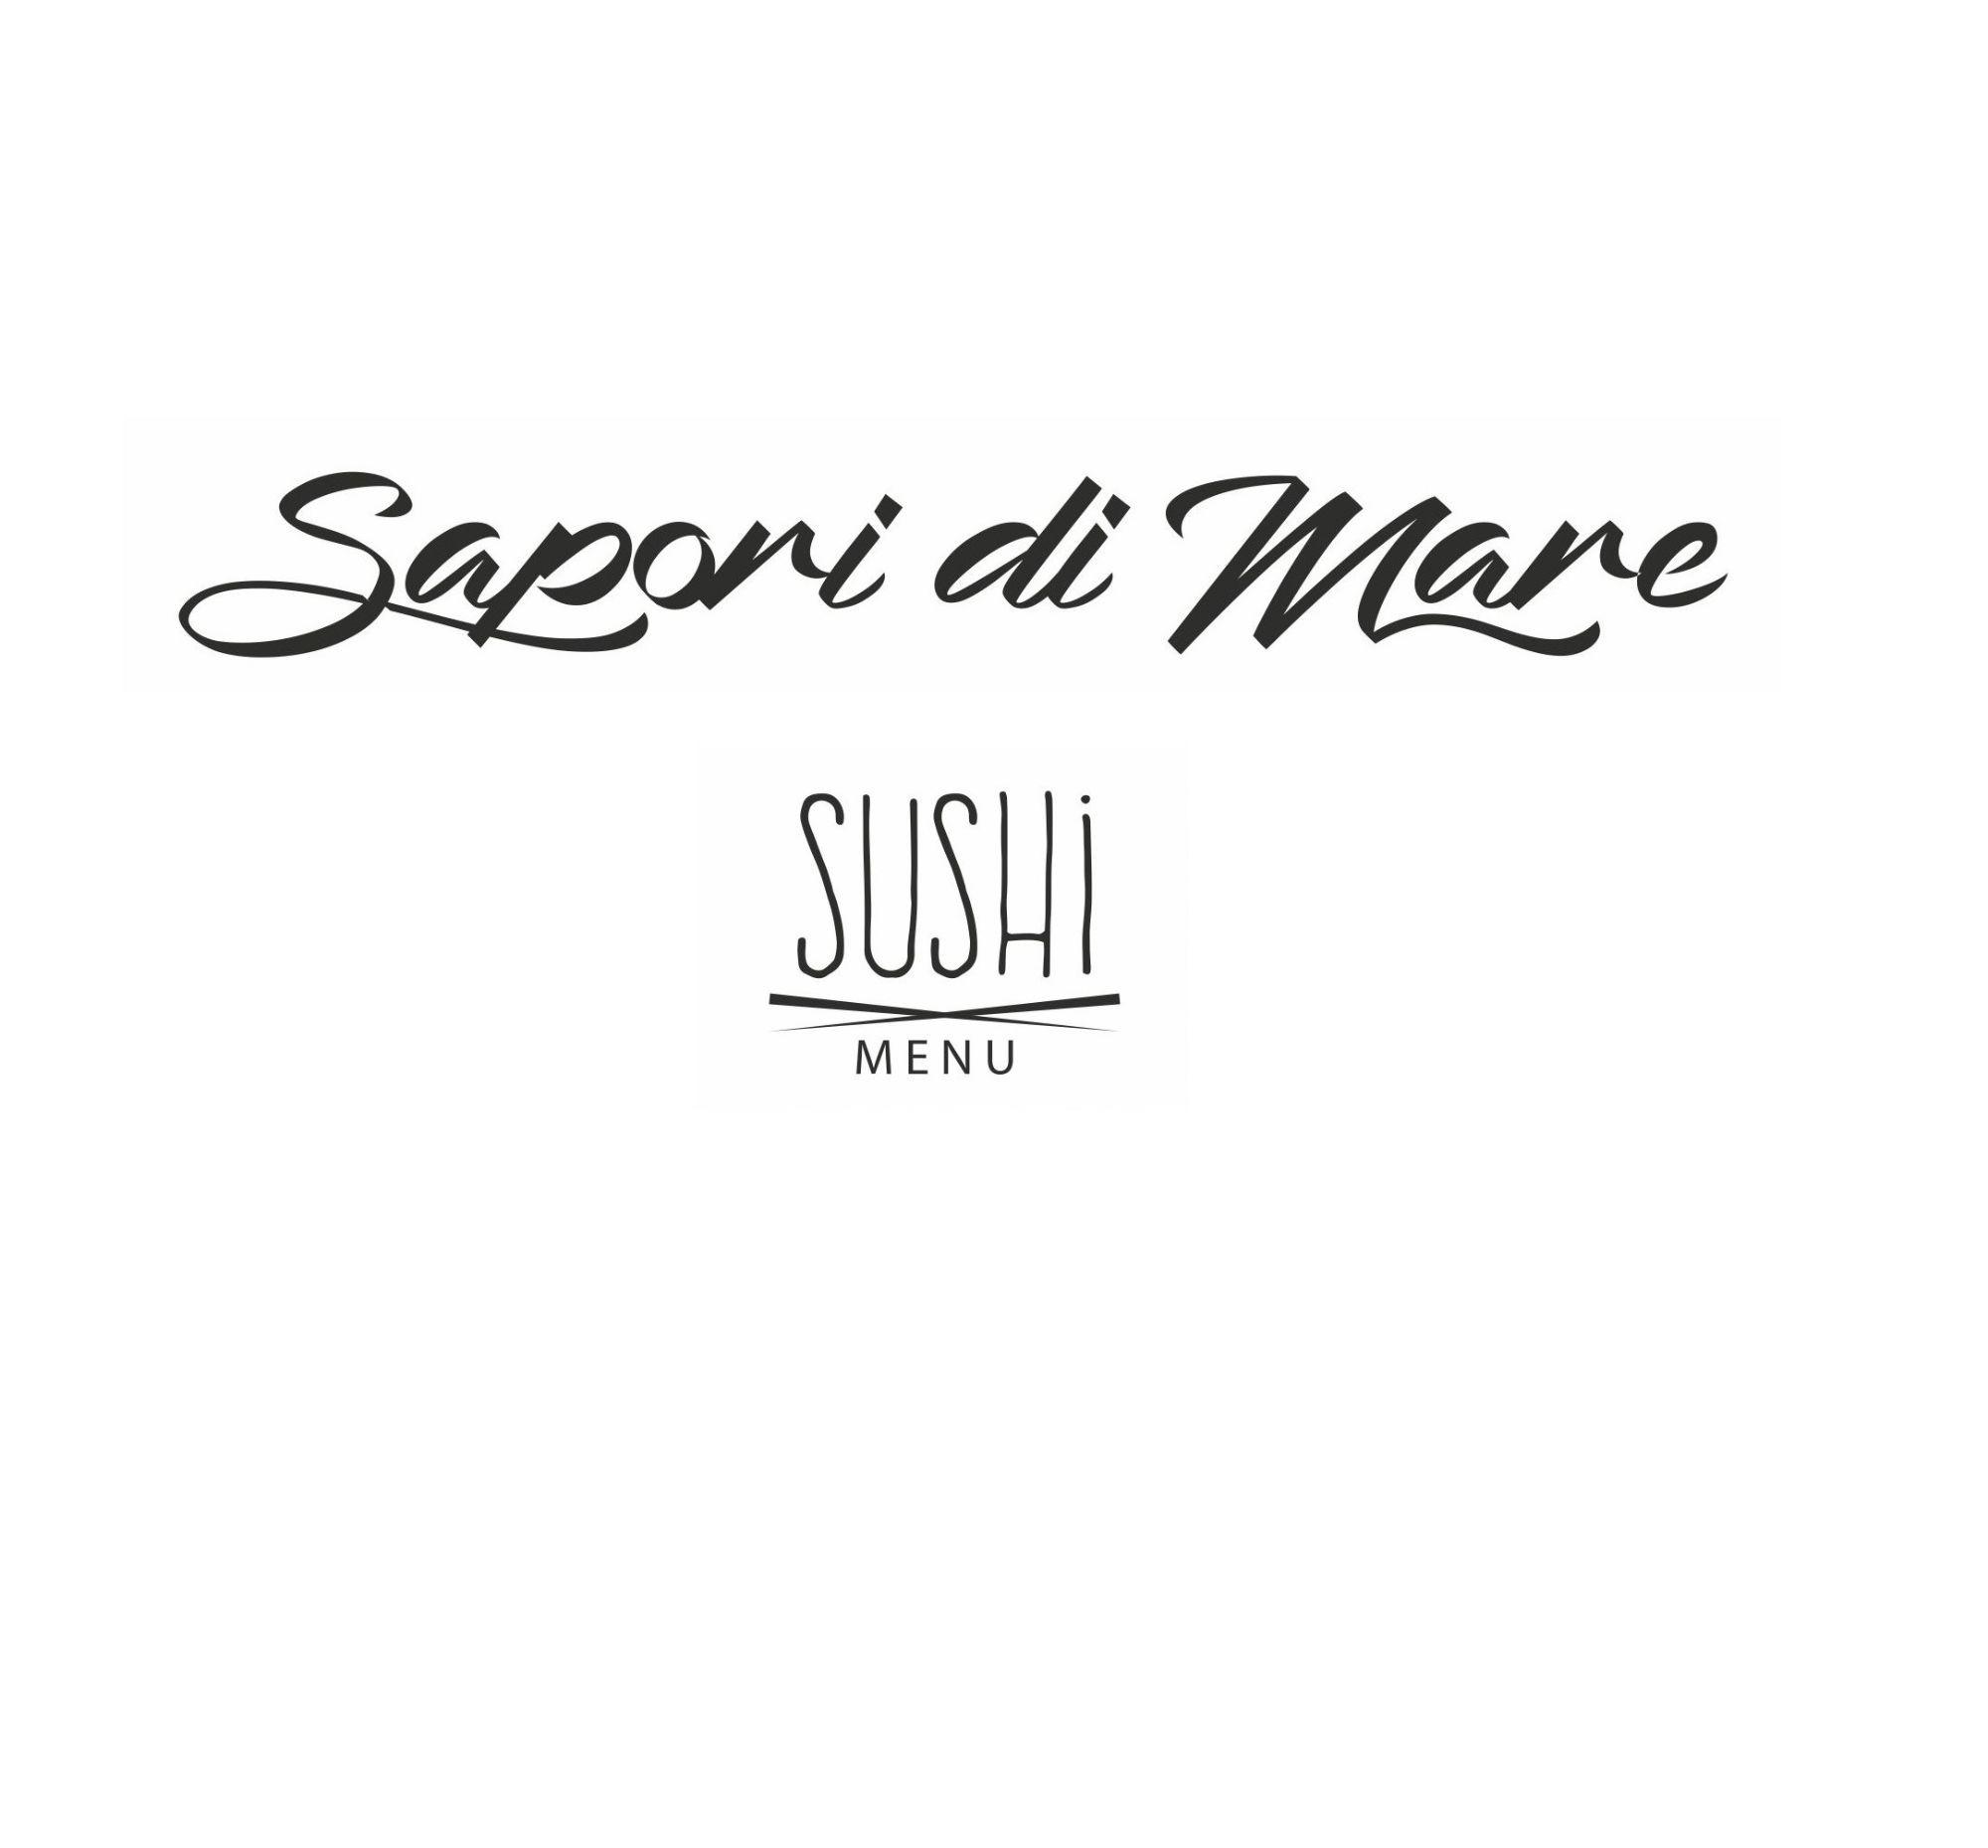 """Sapori di Mare""  Pescheria, Gastronomia & Sushi - Via Bixio, 172 - 97019 Vittoria (RG)"